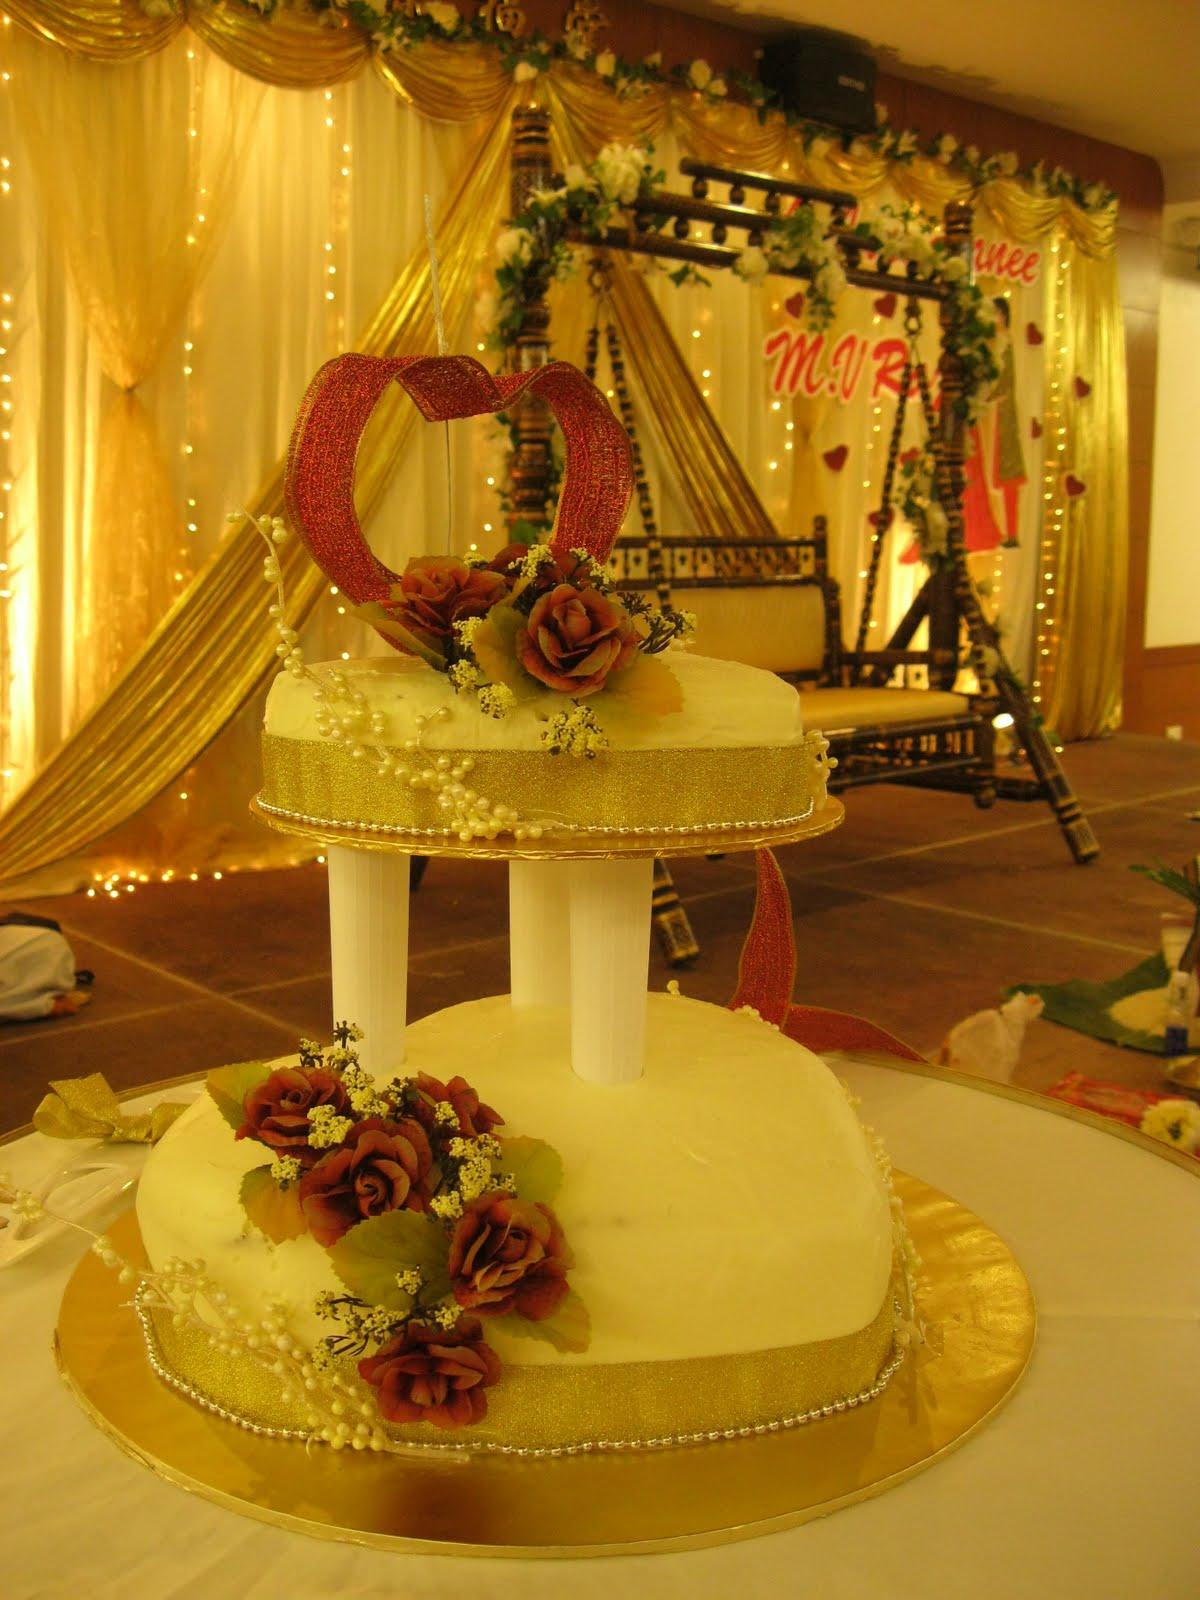 Sweet Temptations Homemade Cakes & Pastry: Wedding Cake